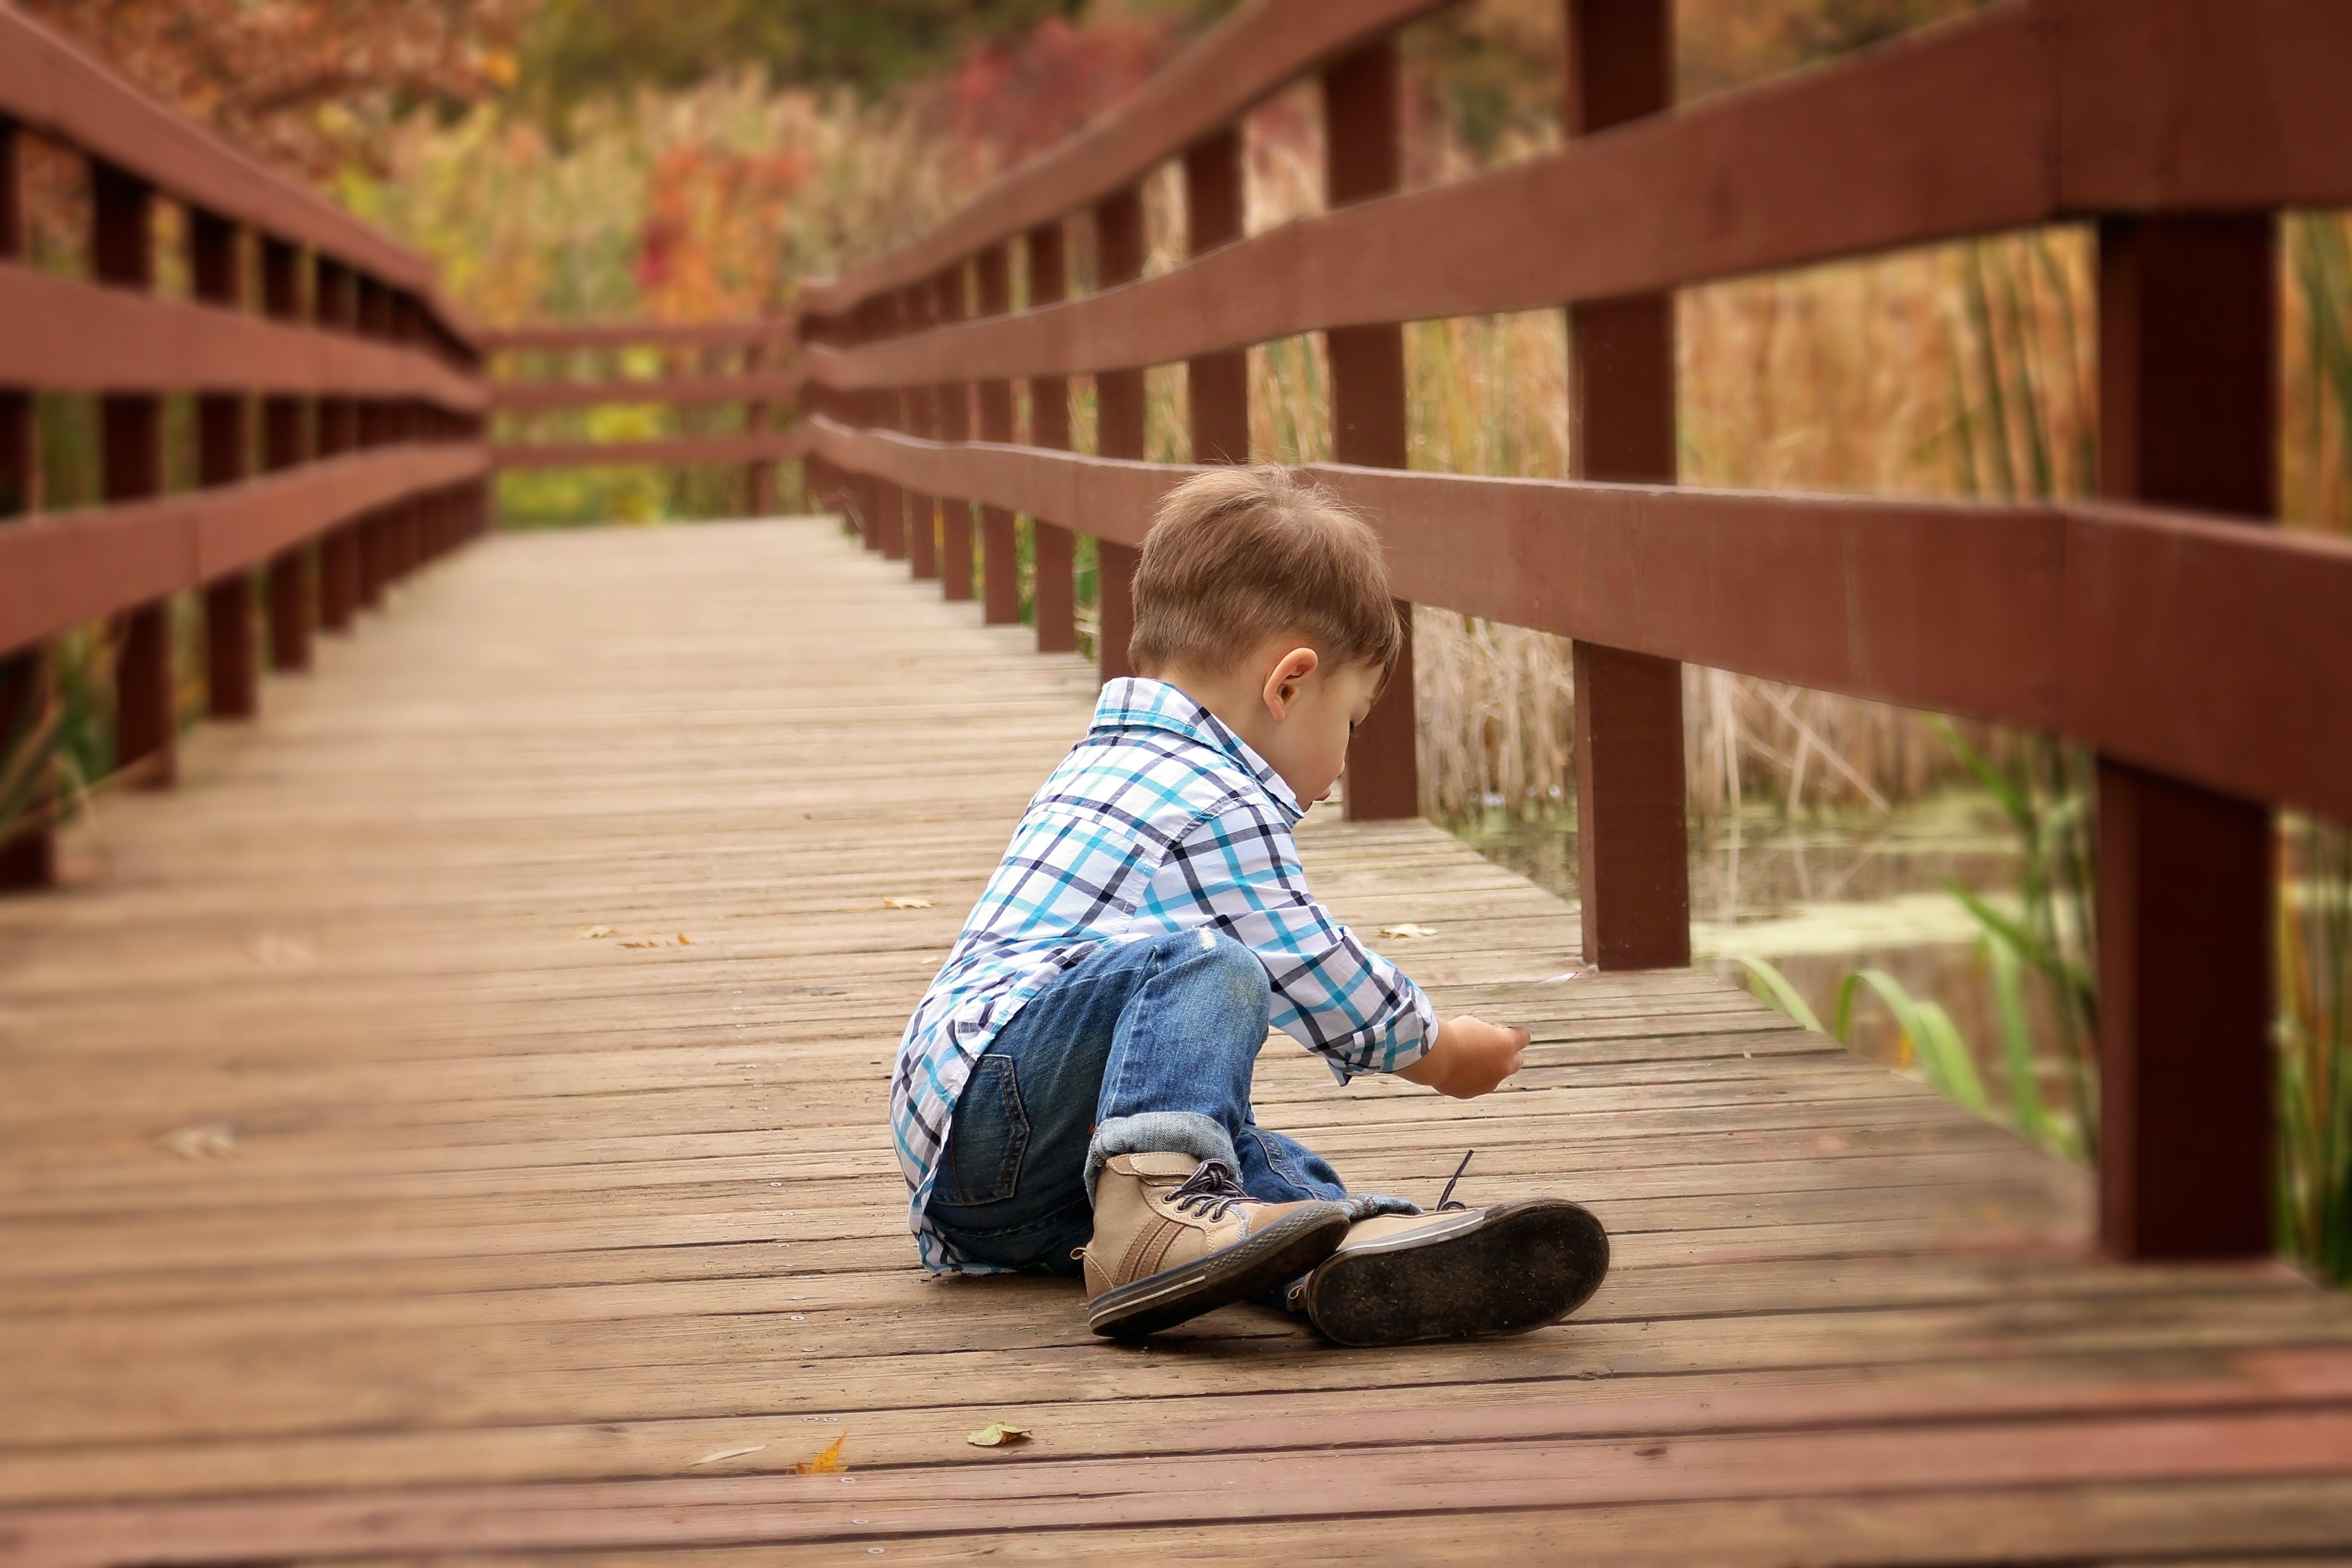 activity, boy, bridge